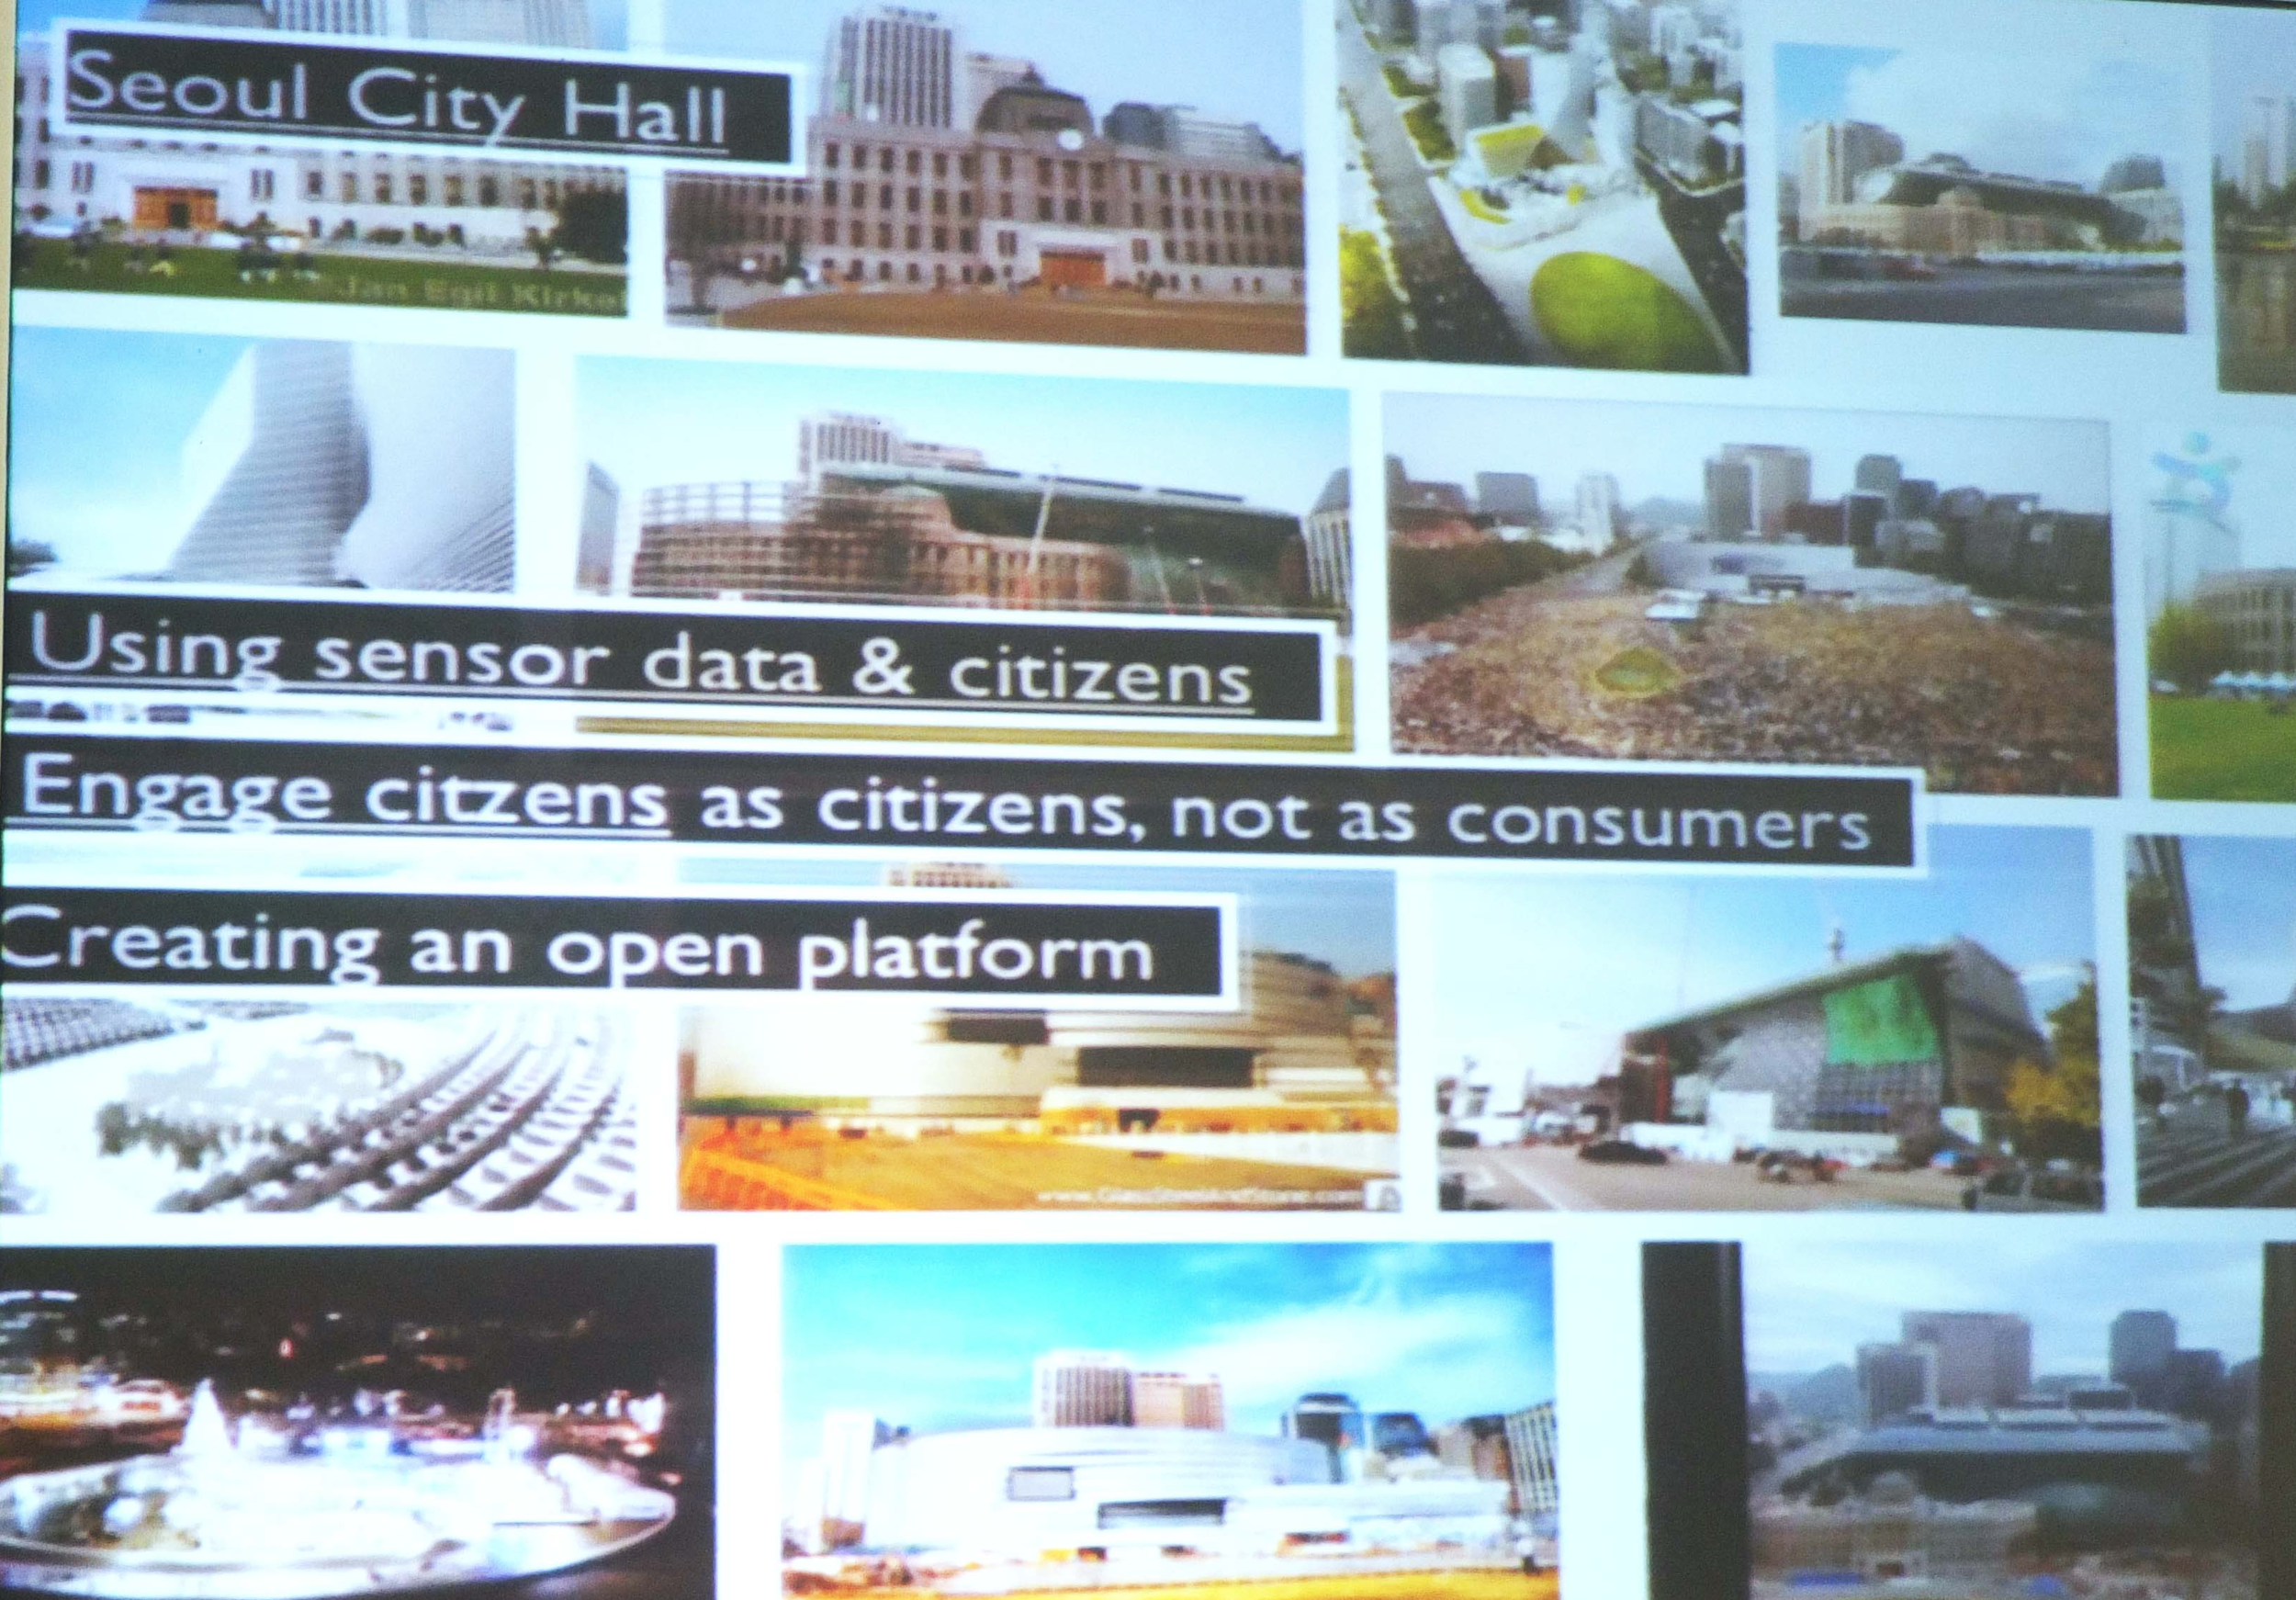 Martijn de Waal's presentation on Seoul